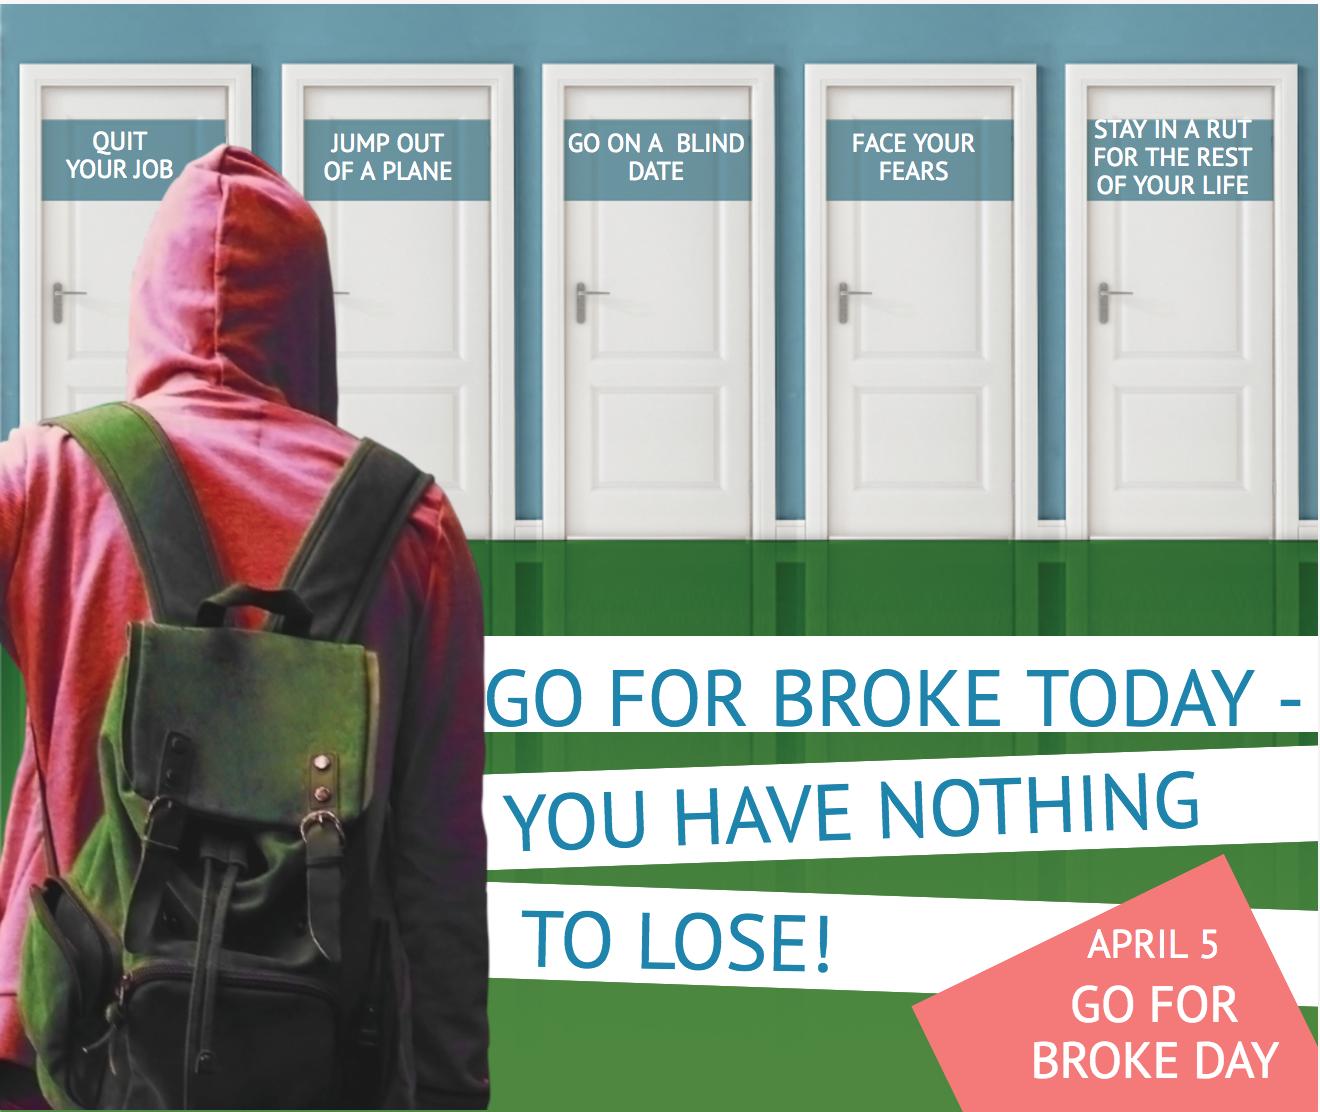 go for broke day image